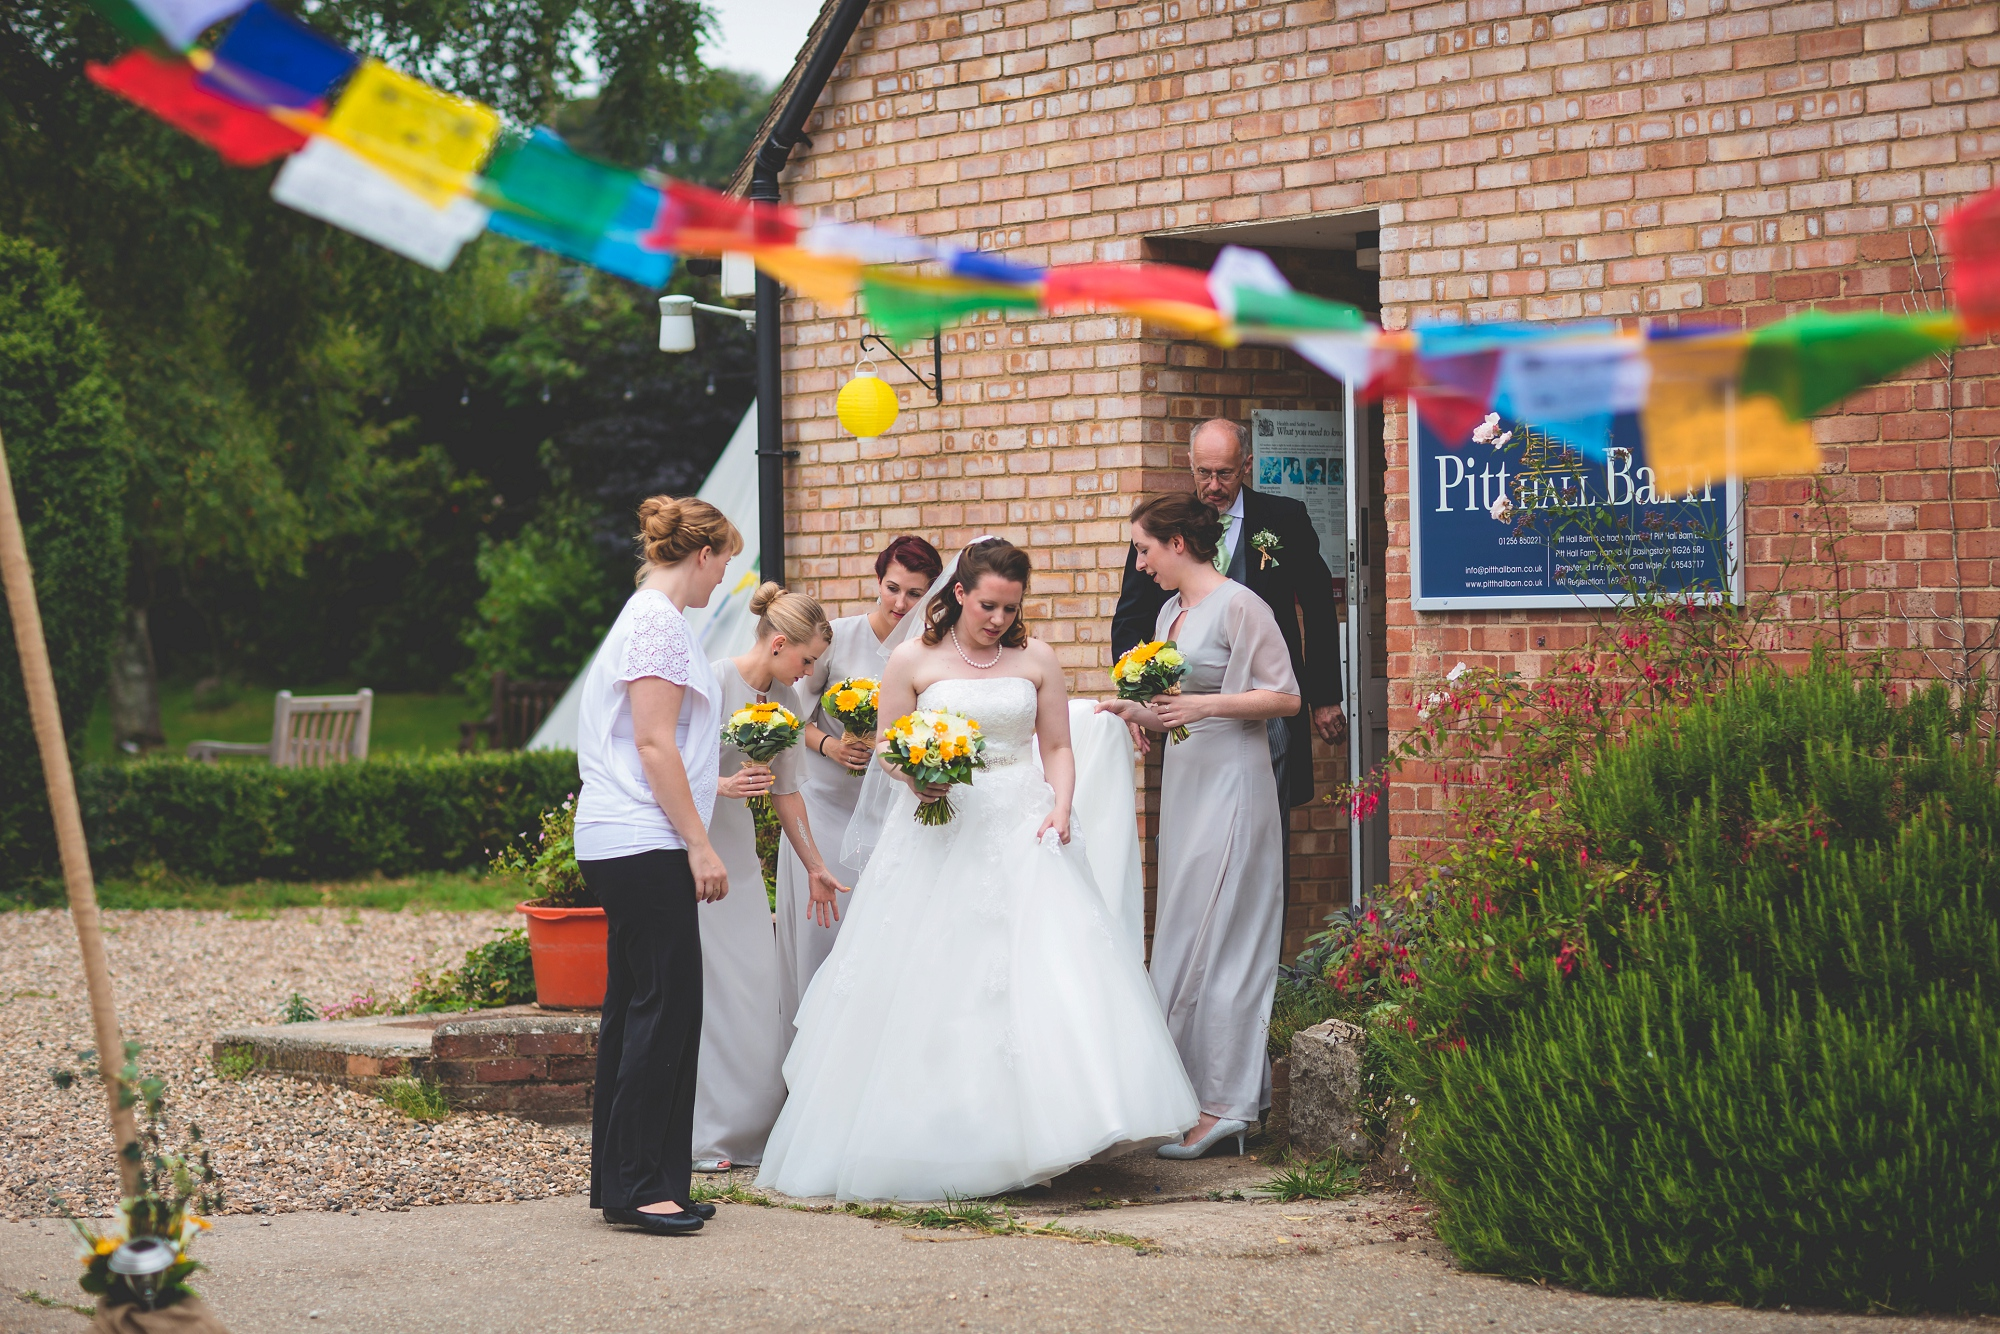 pitt_hall_barn_wedding_0040